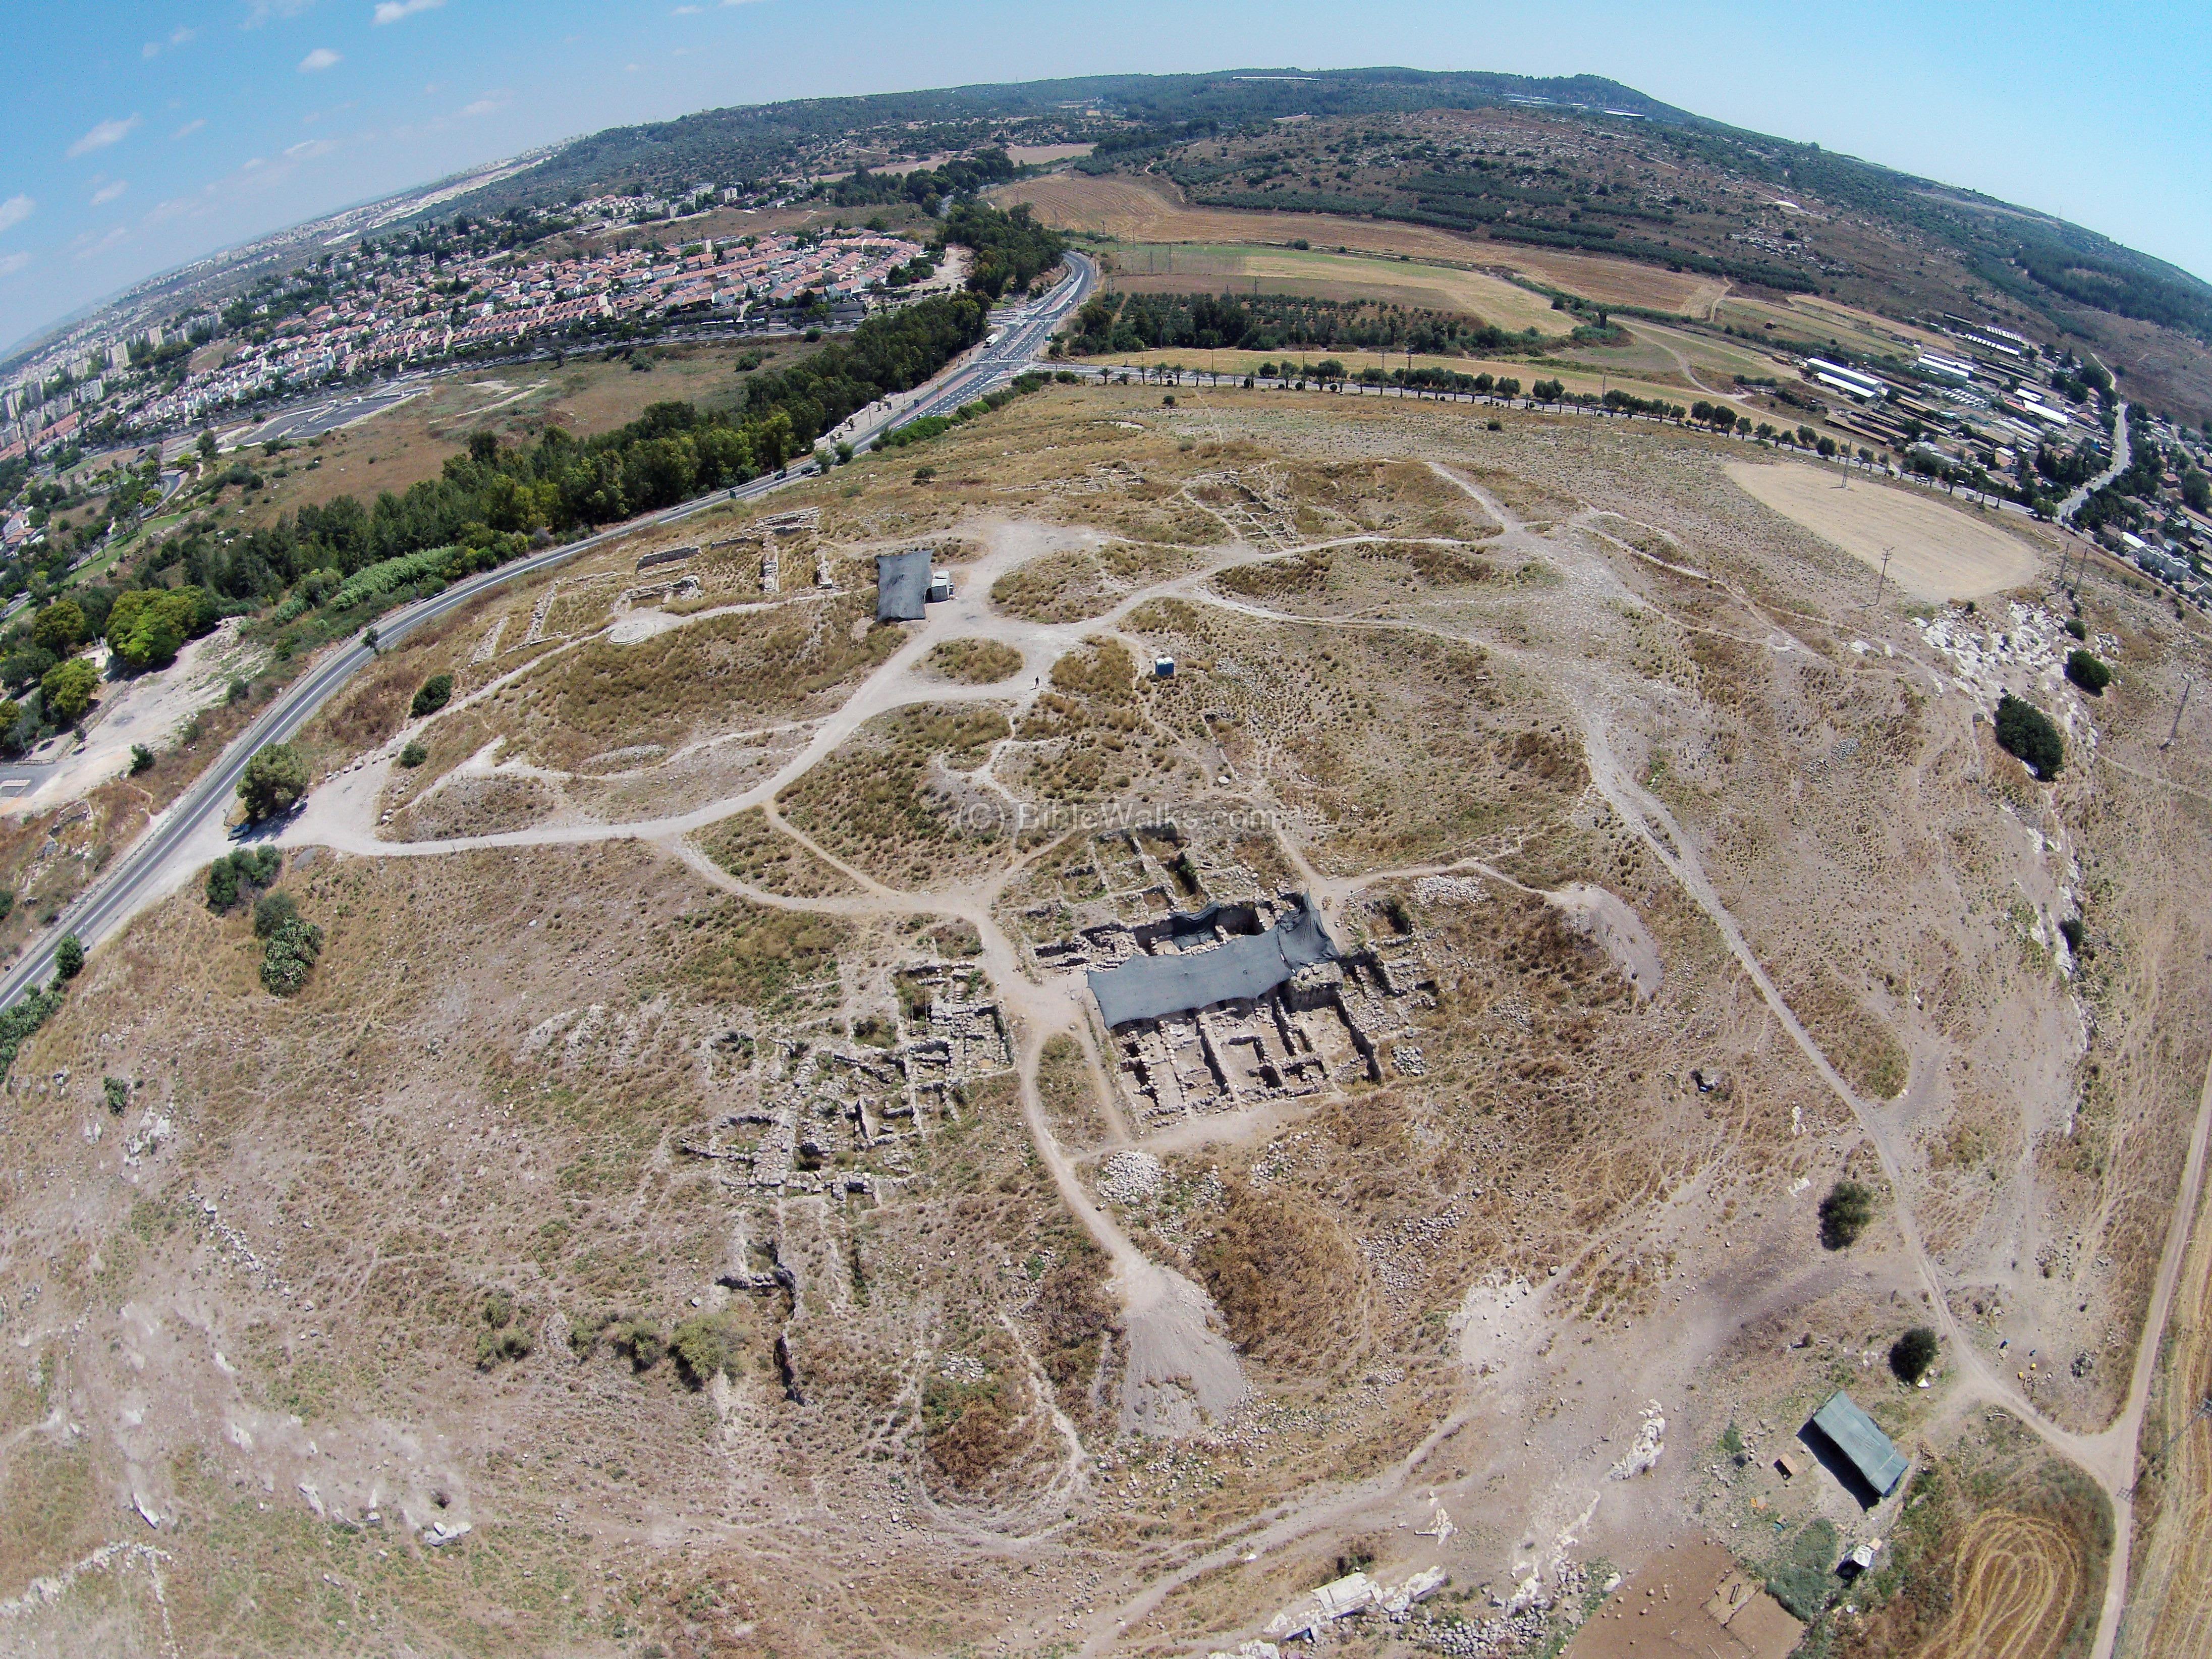 Beth Shemesh Bible Maps: Aerial Views (Page 2